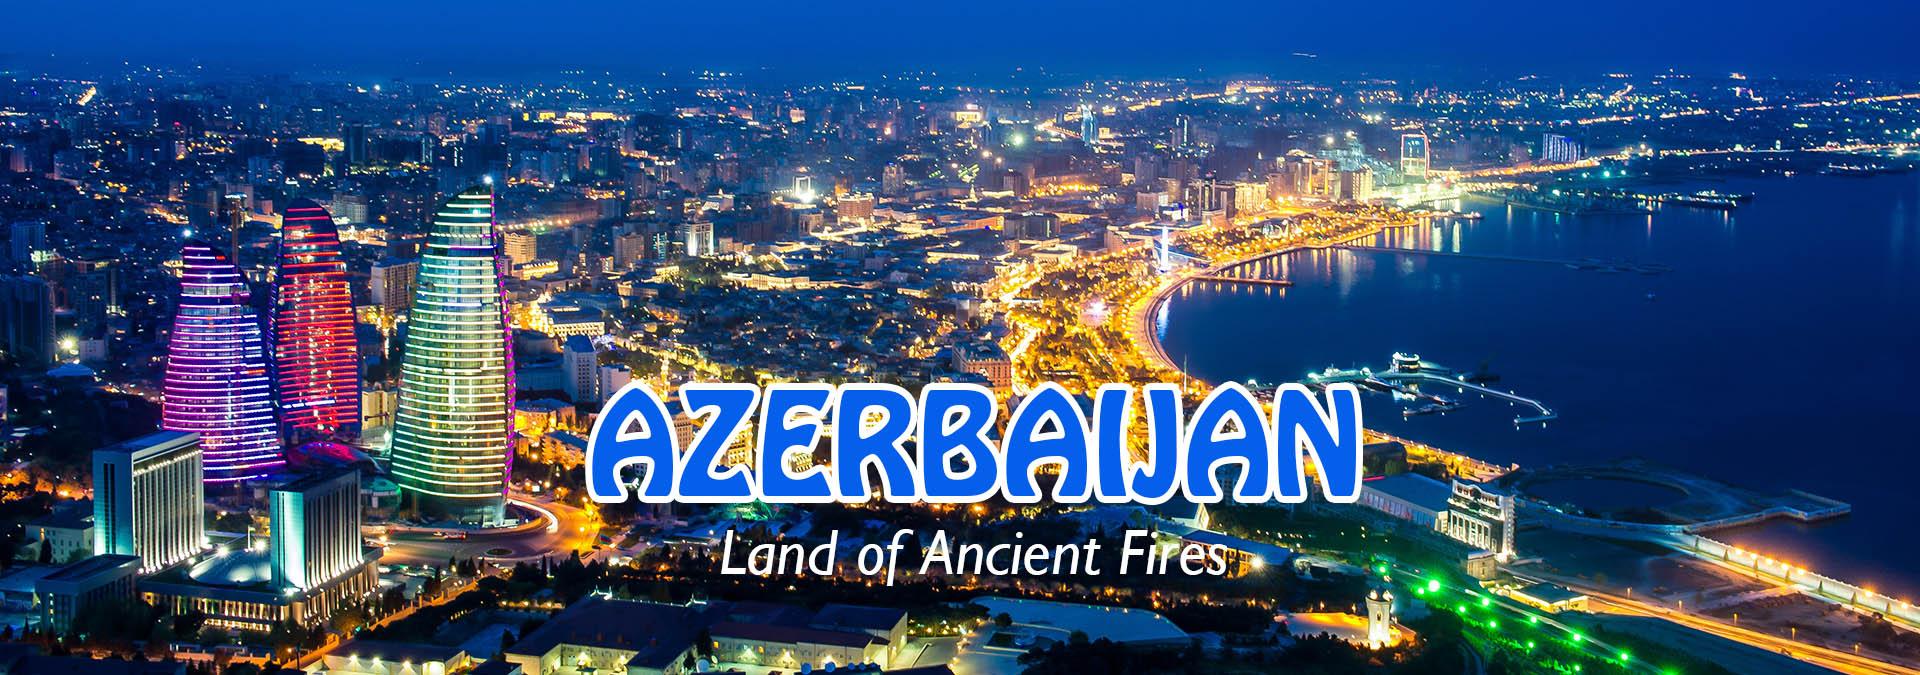 Baku Azerbaijan Tour Packages From DubaiUAE Baku Holiday Packages - Where is baku